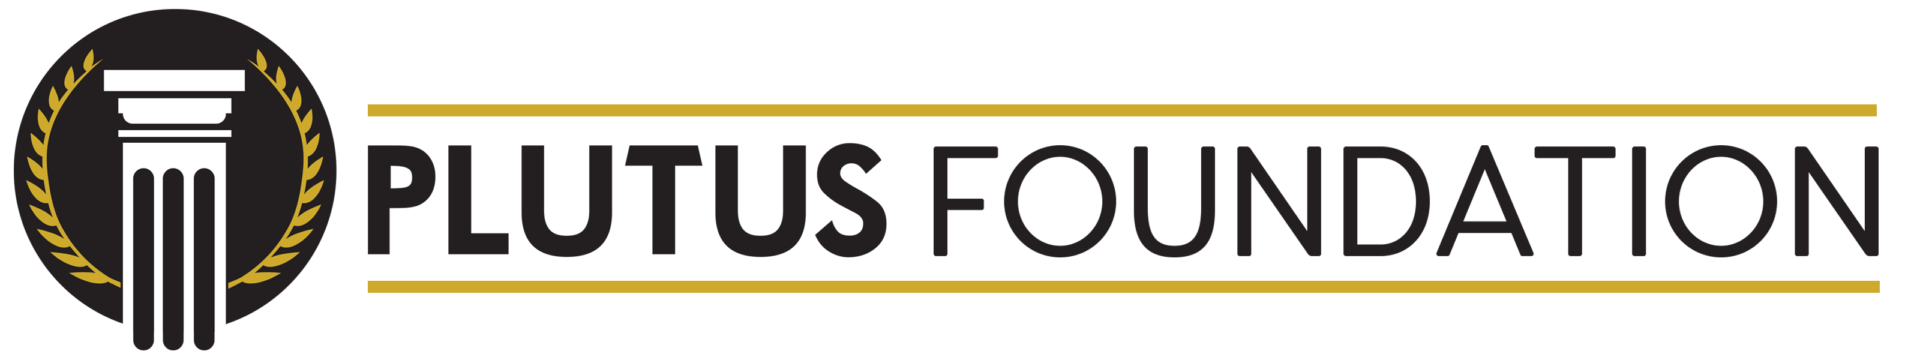 The Plutus Foundation